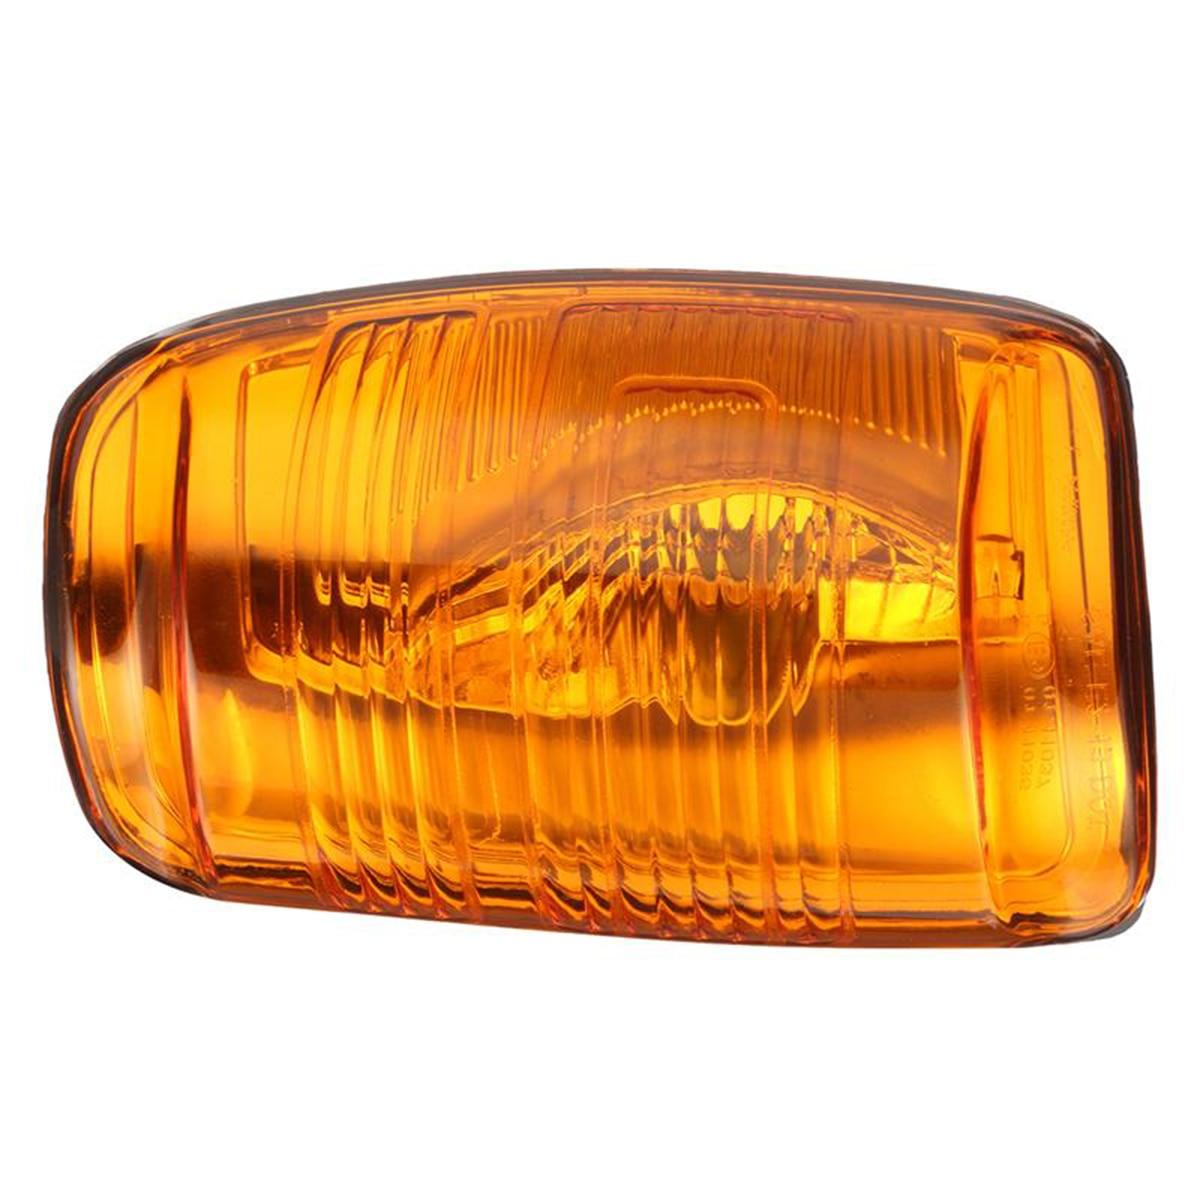 Transit Parts Transit MK6 MK7 Front Left Lh Side Indicator Repeater Light Lamp Orange